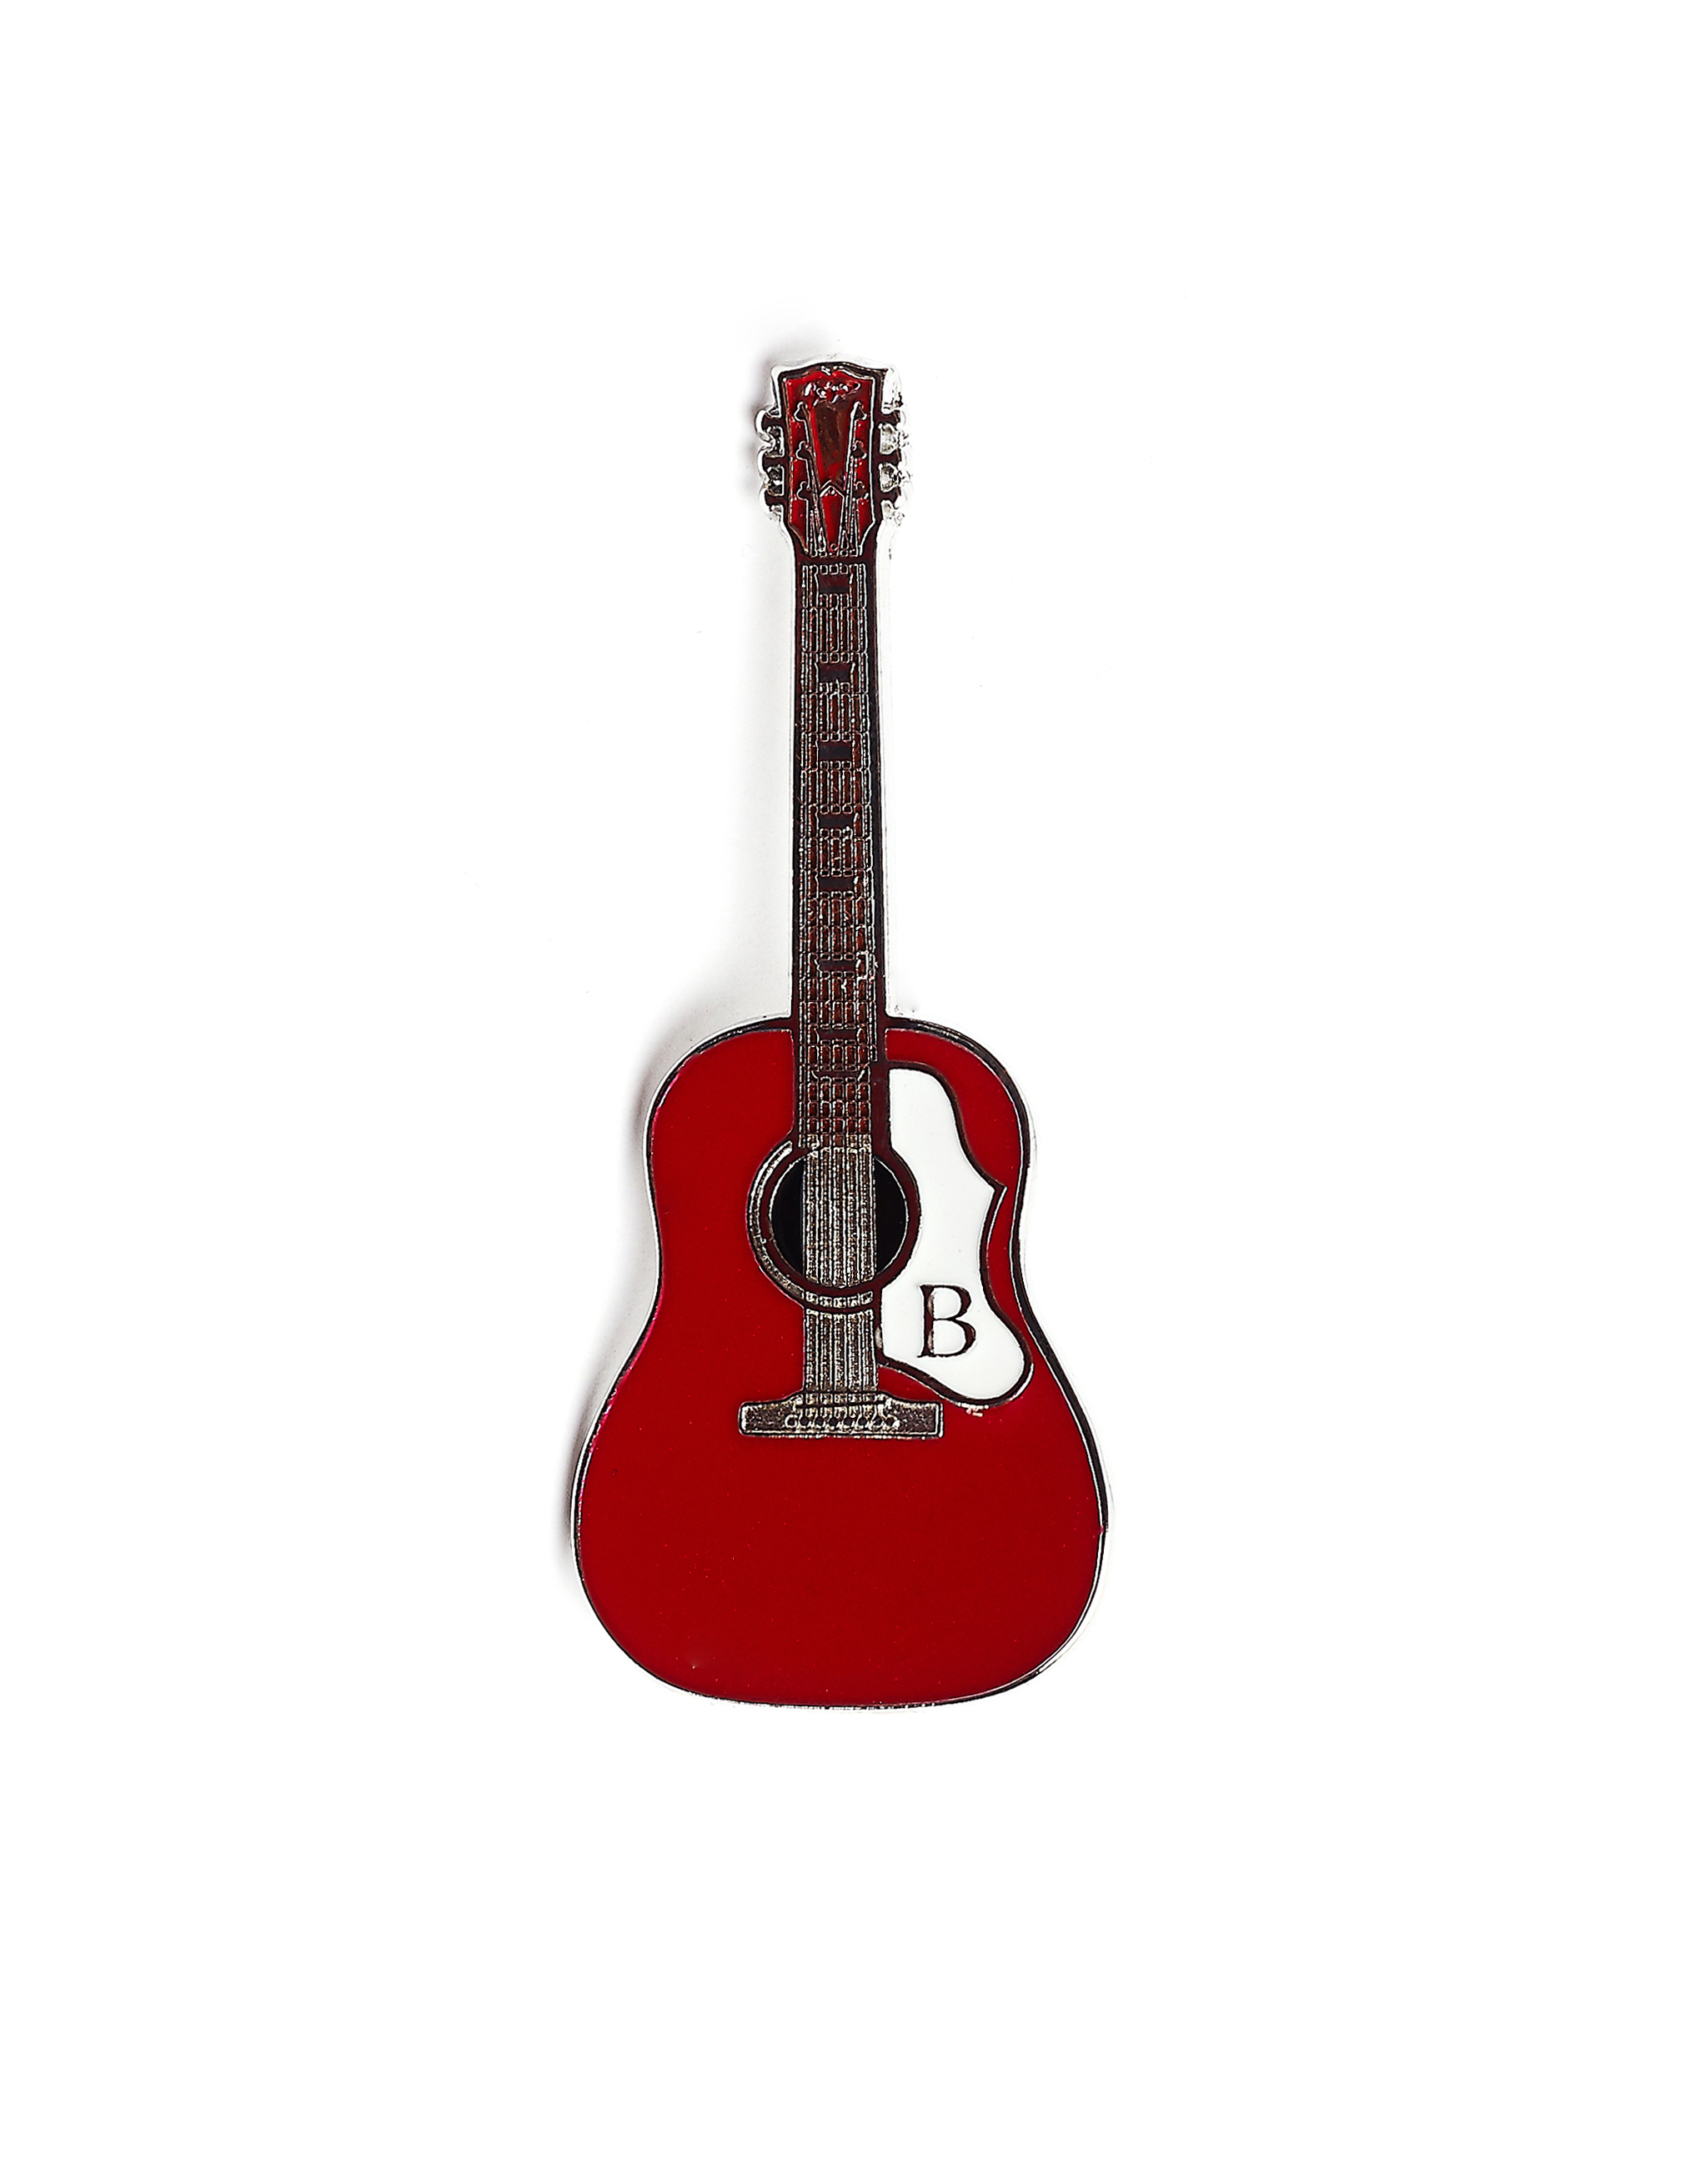 Yohji Yamamoto Red Guitar Pin Badge